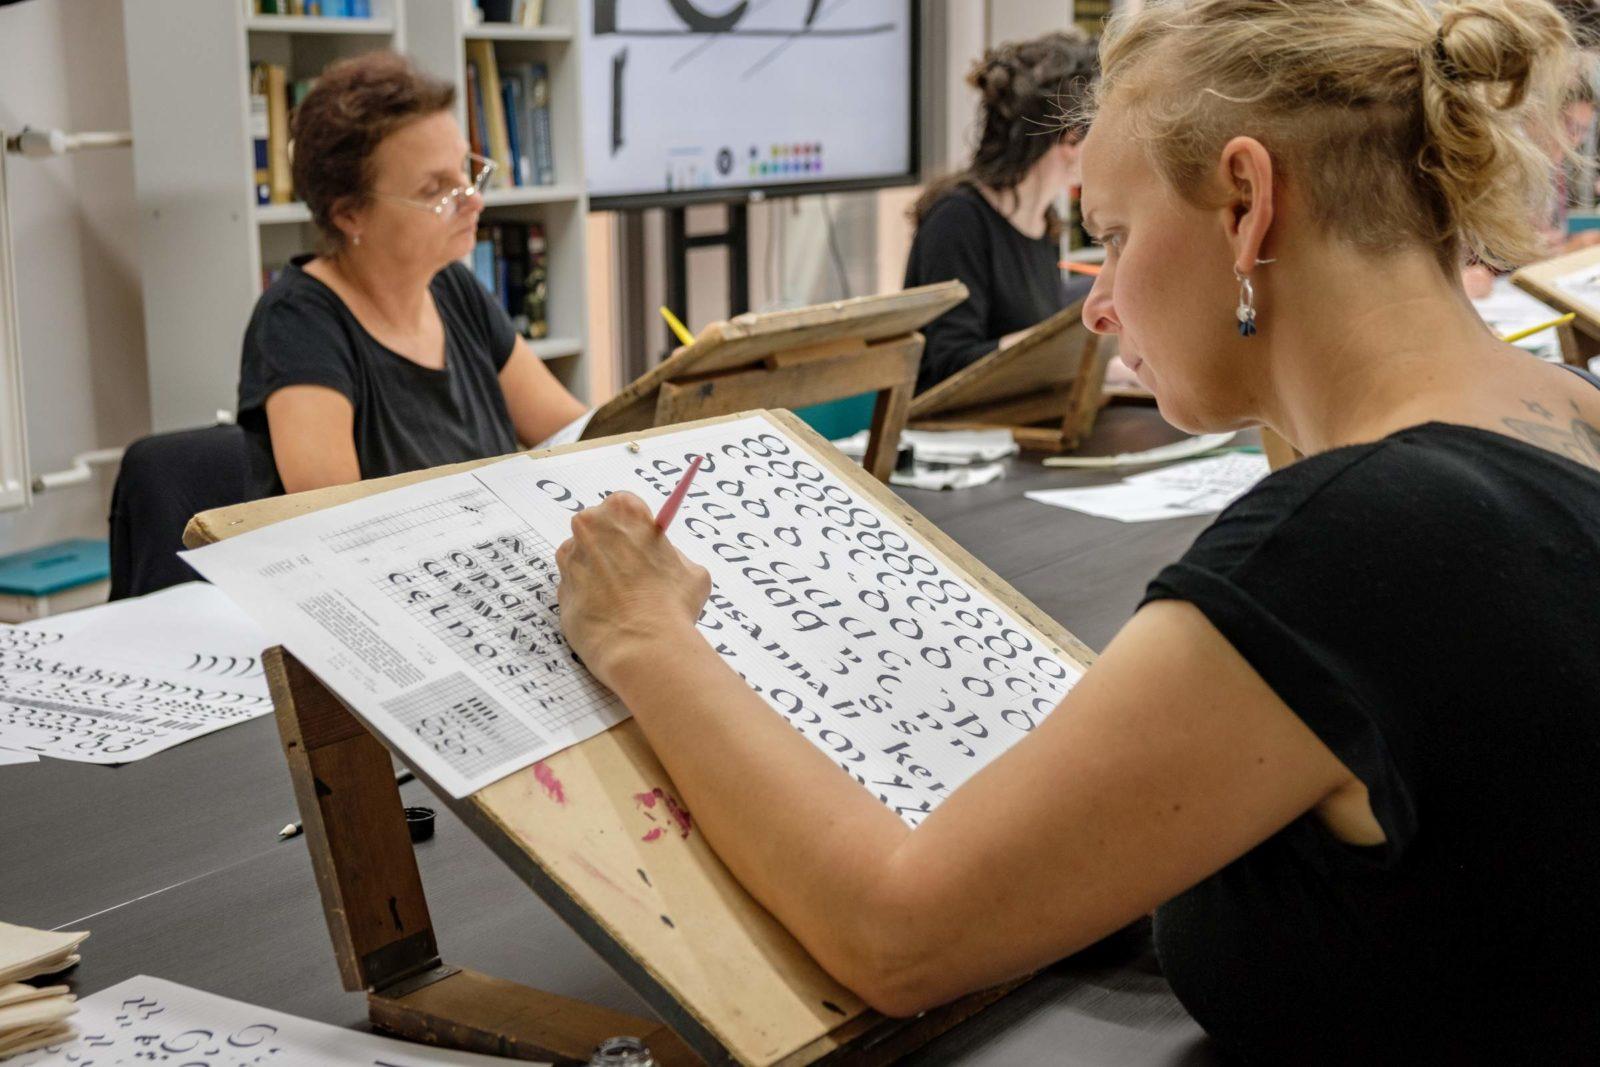 Warschau_2019_Workshop_Calligraphy_IADA_201